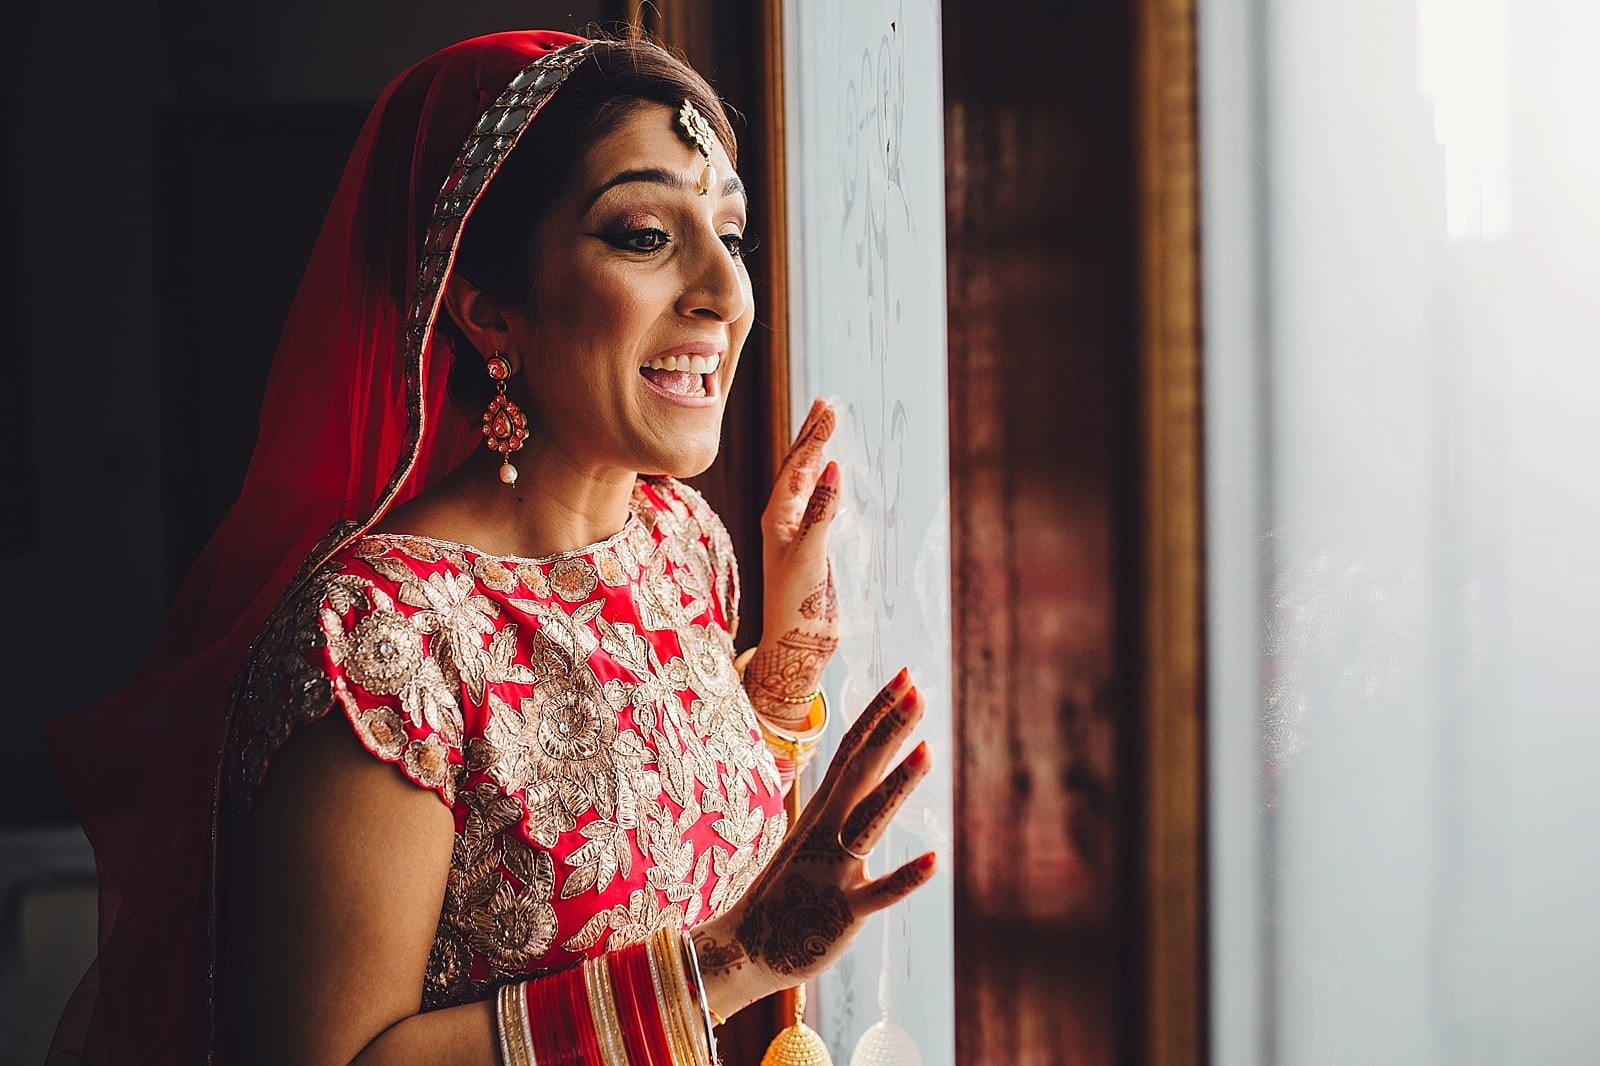 sikh-wedding-photography-birmingham-edgbaston_0113